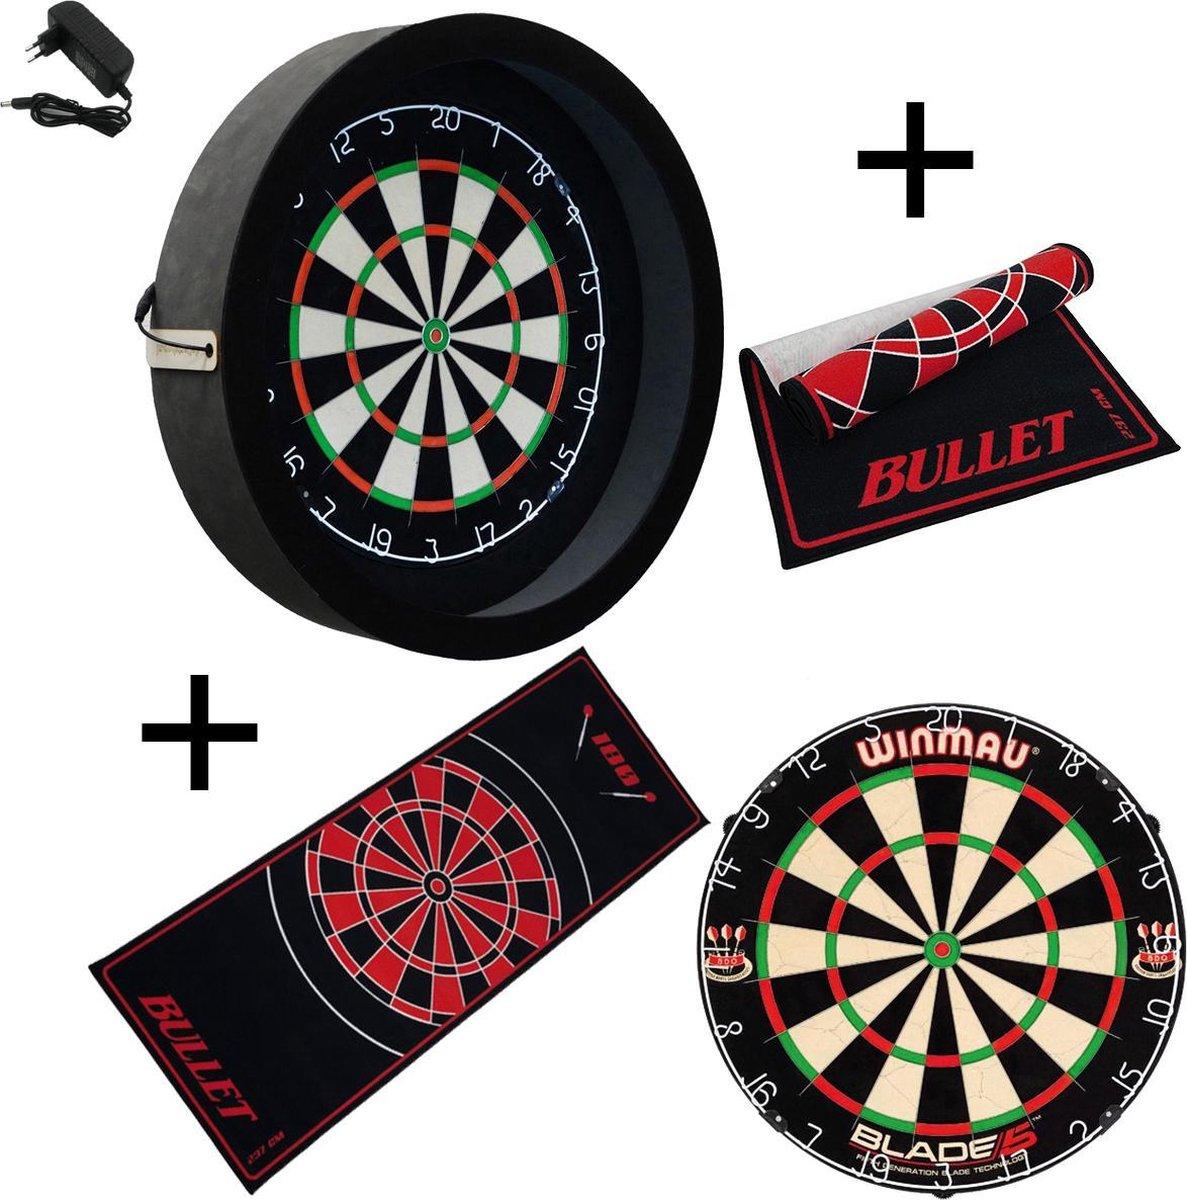 Dragon - Sorpresa PRO - Complete PRO - zwart-bullet rood - Winmau Blade 5 - dartmat antraciet - dartbord verlichting